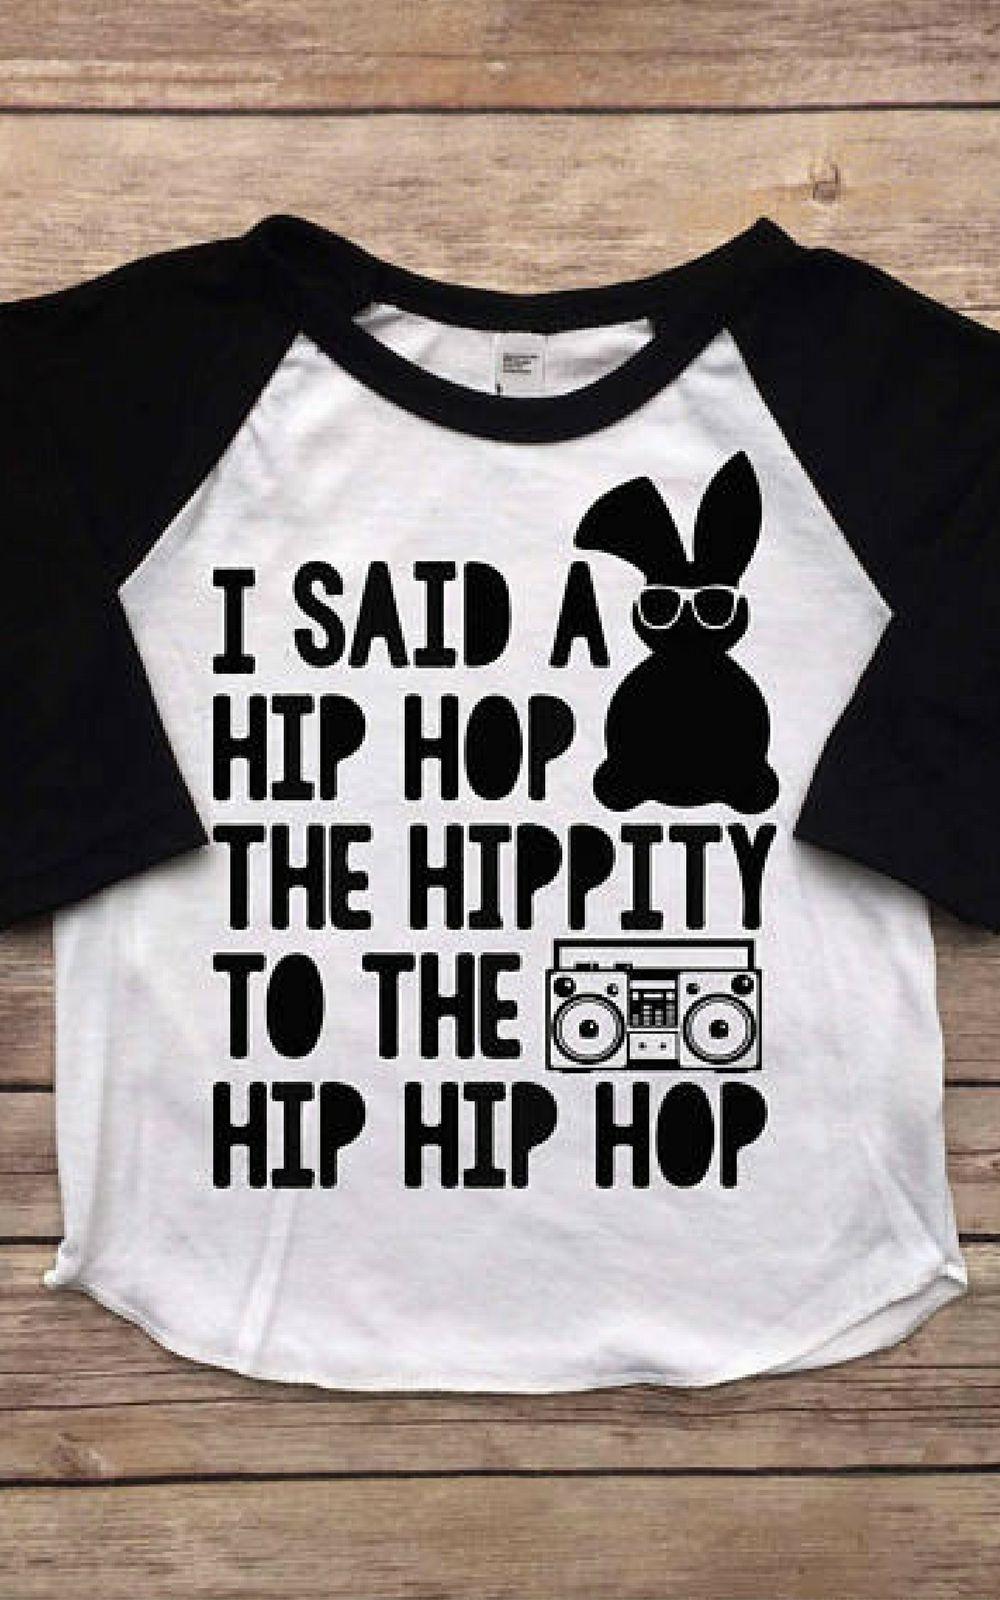 844e2e4c3 Boys Easter Outfit, Boys Easter Shirt, Easter Shirt for Boys, Easter Shirt  for Kids, Easter Shirt Toddler, Funny Easter Shirt, Easter Outfit  #affiliate ...